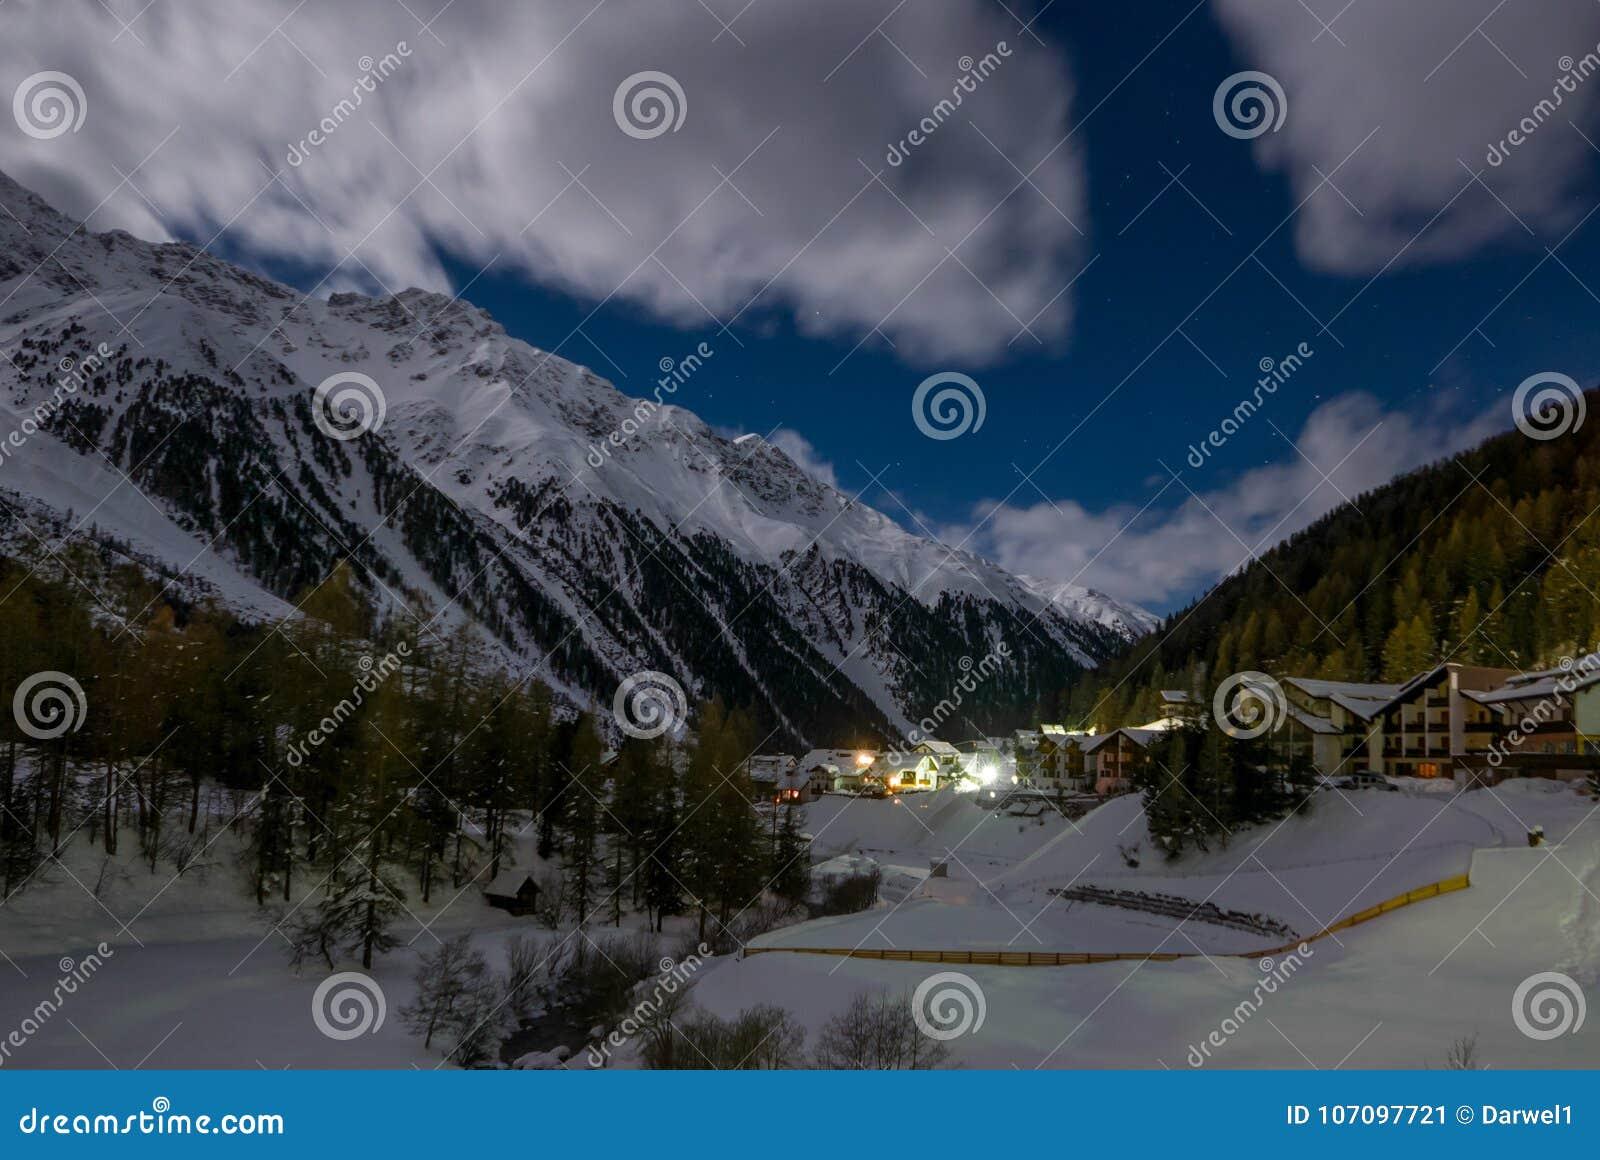 beautiful night scenery of popular ski resort solda sulden stock